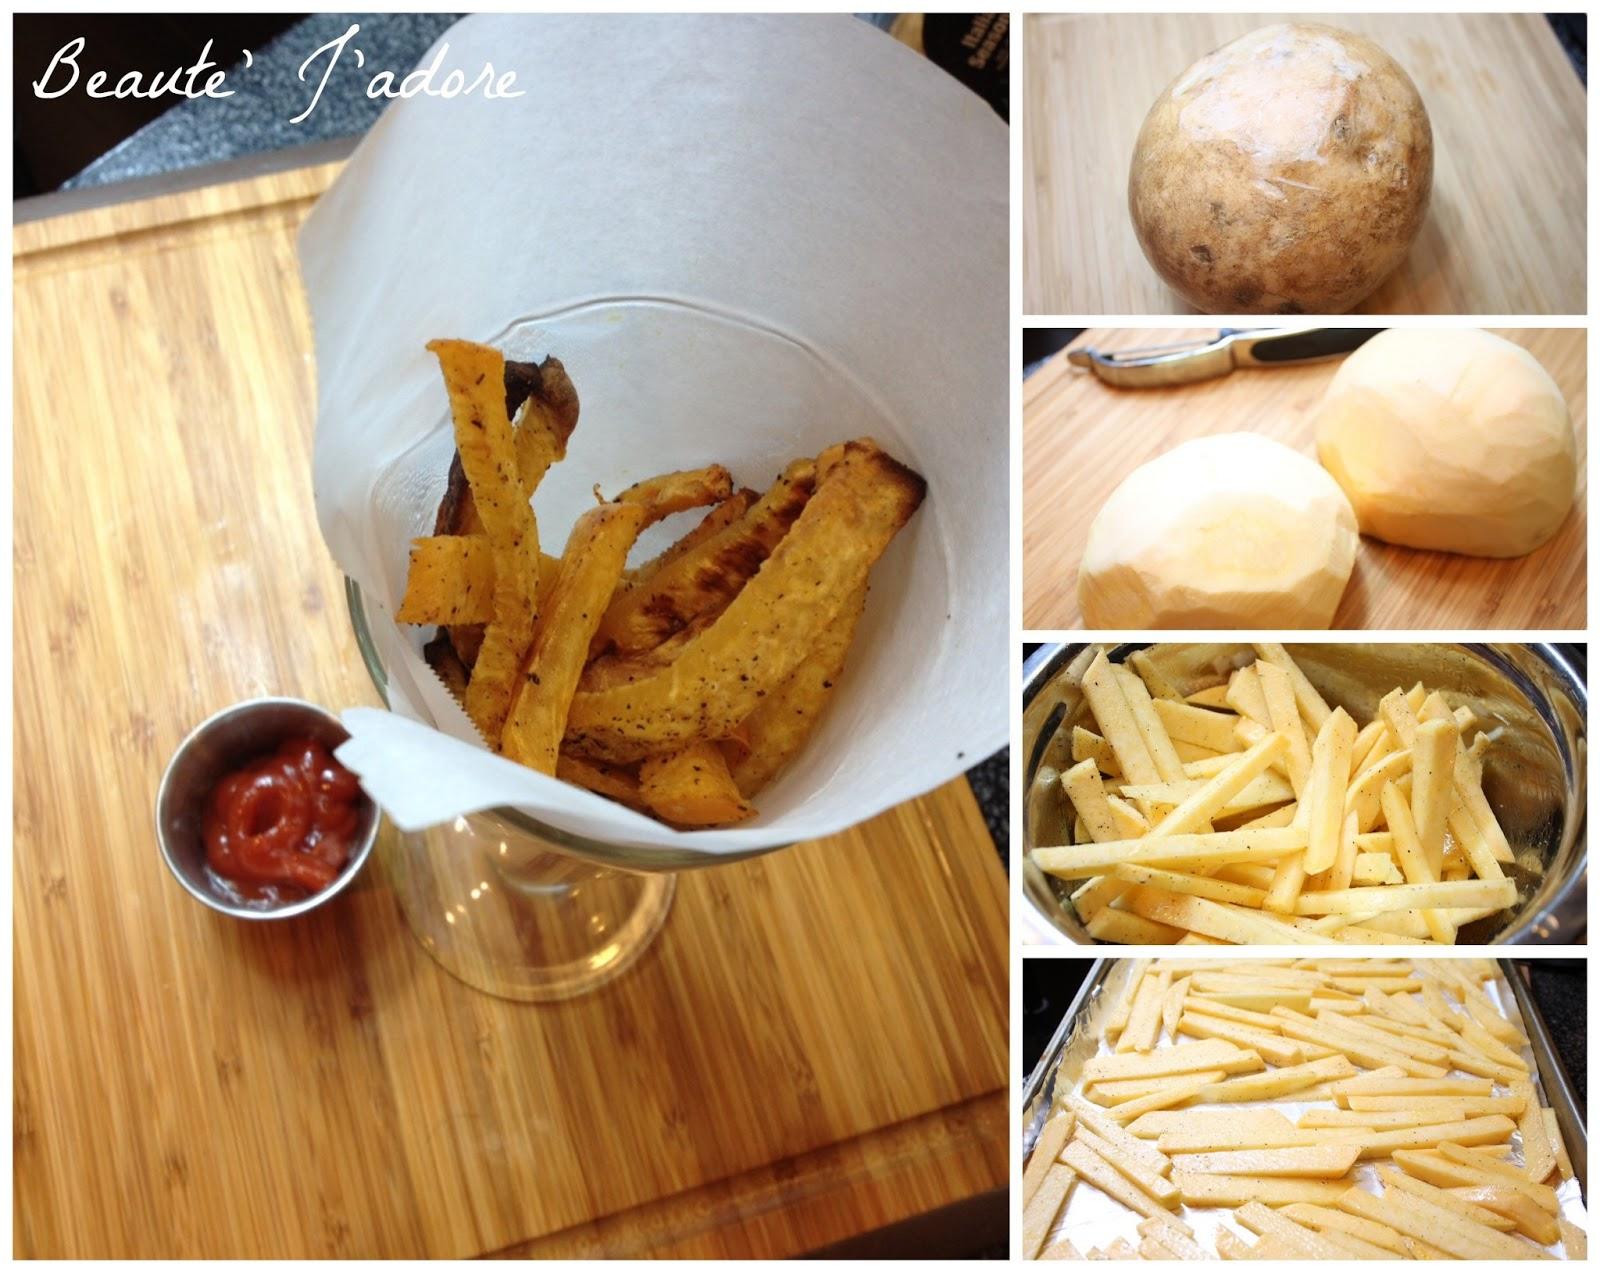 Guilt Free Rutabaga French Fries – Beaute' J'adore